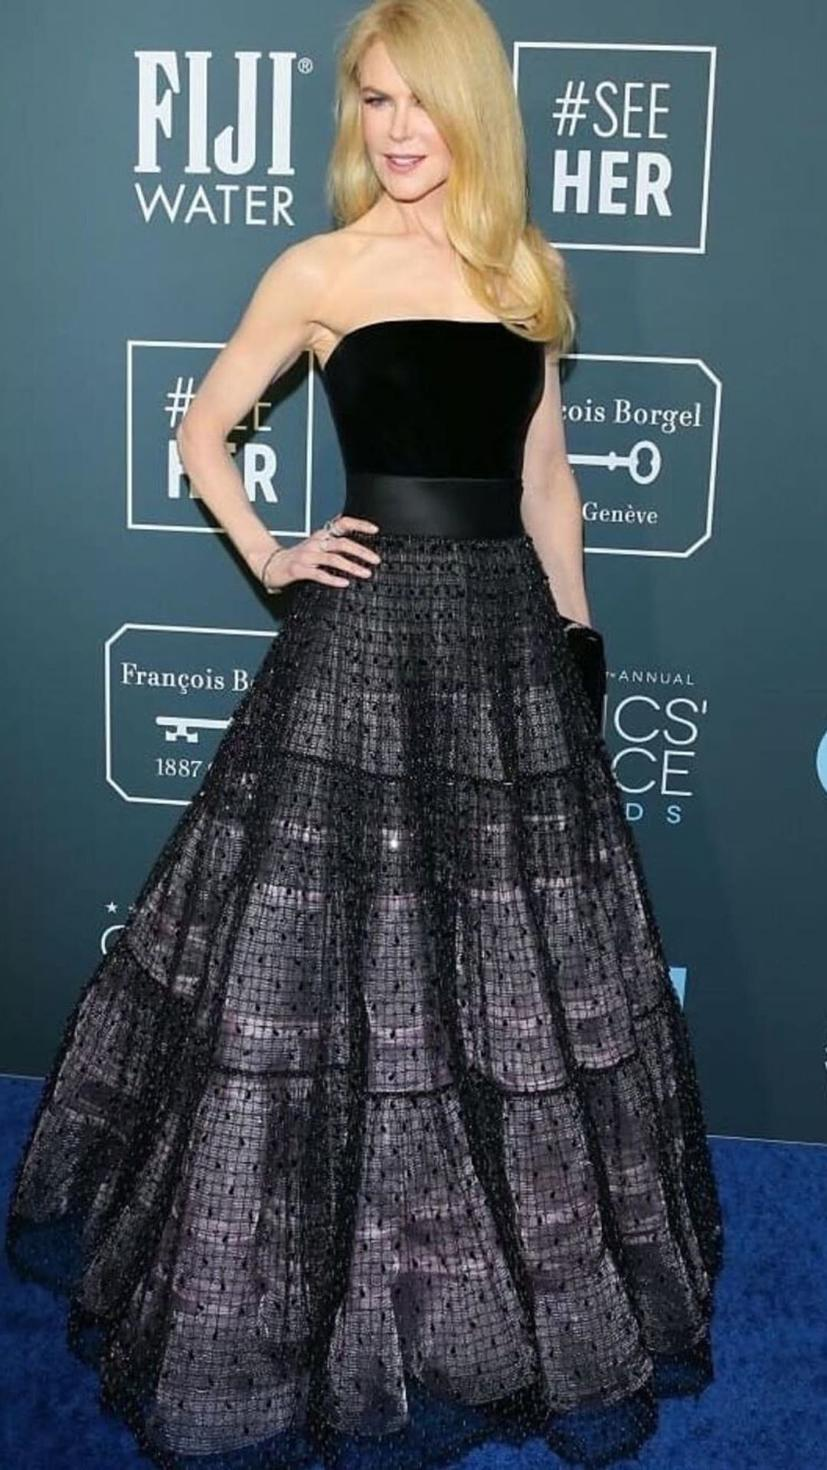 Nicole Kidman wears a black dazzling Armani gown, Omega jewels and Harry Winston jewels.